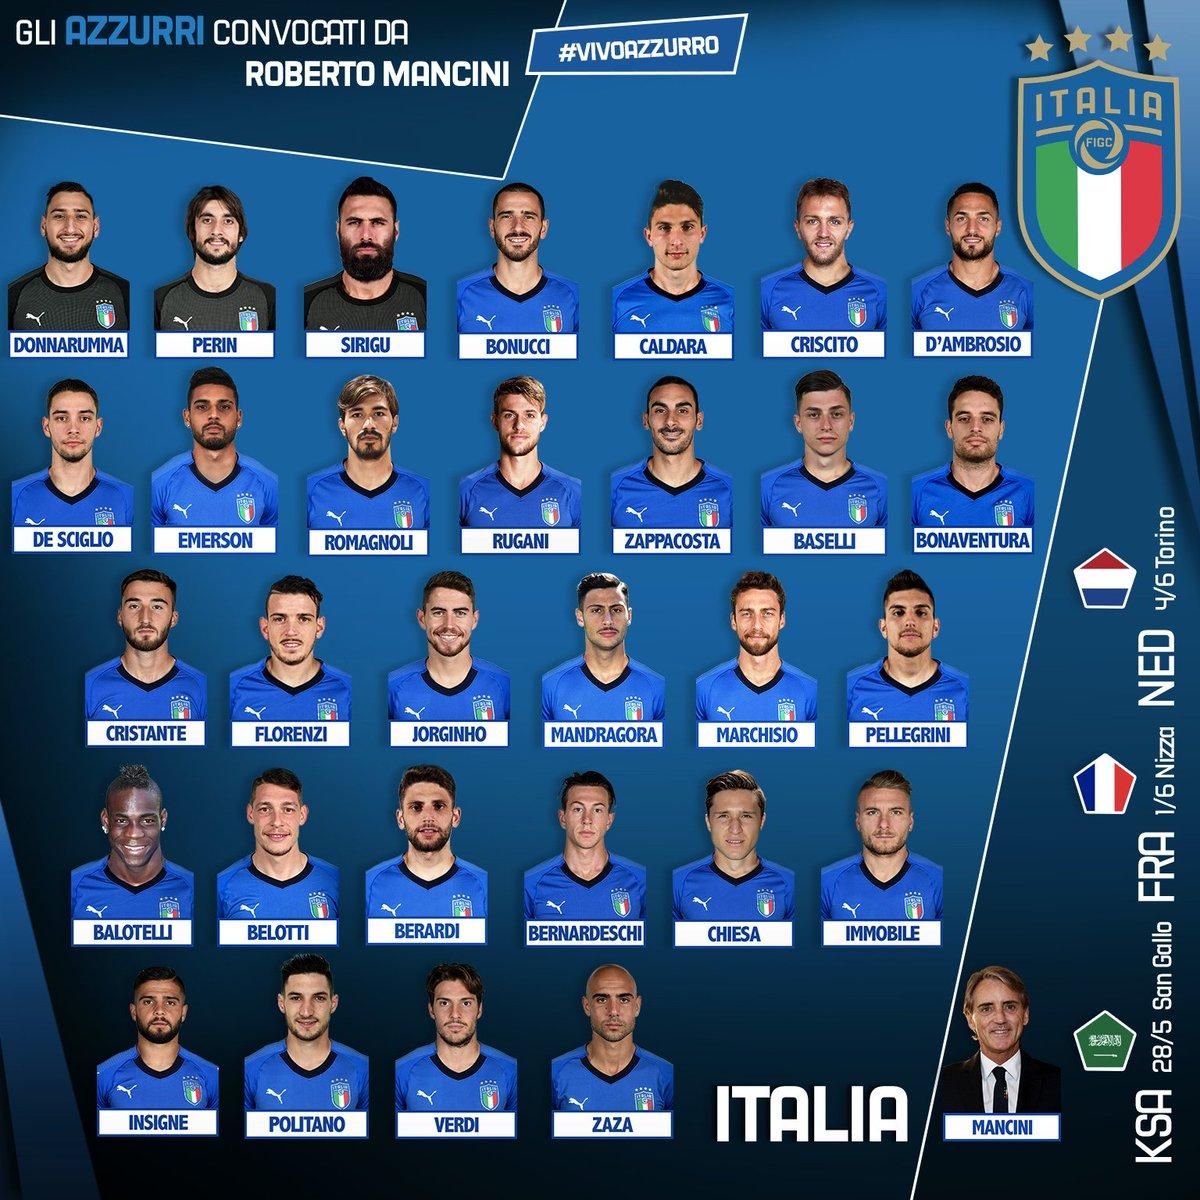 Mancini Squad